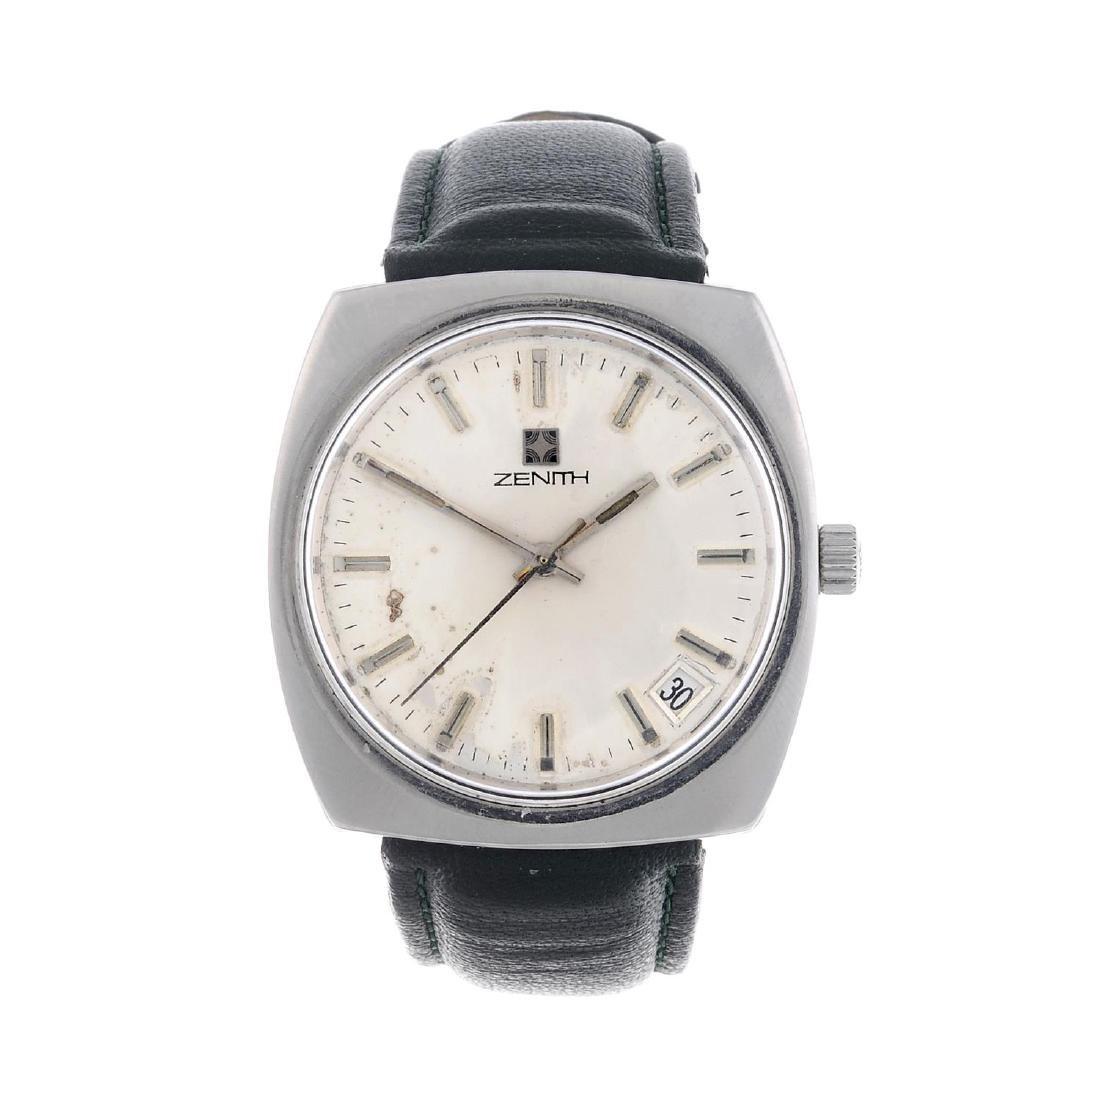 ZENITH - a gentleman's wrist watch. Stainless steel